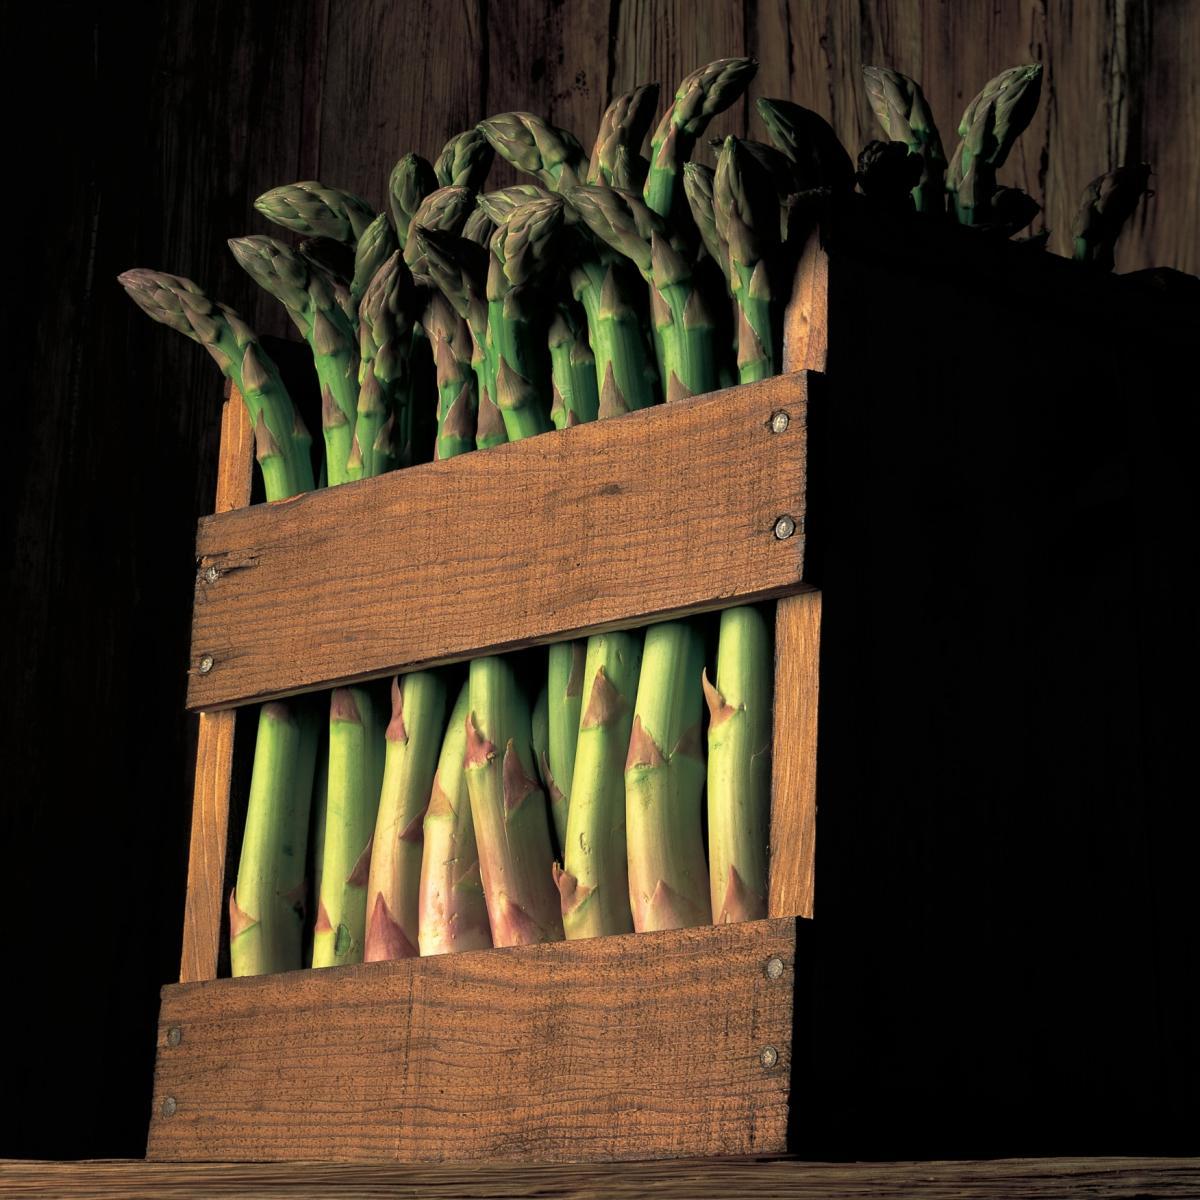 Ingredient vegetarian asparagus